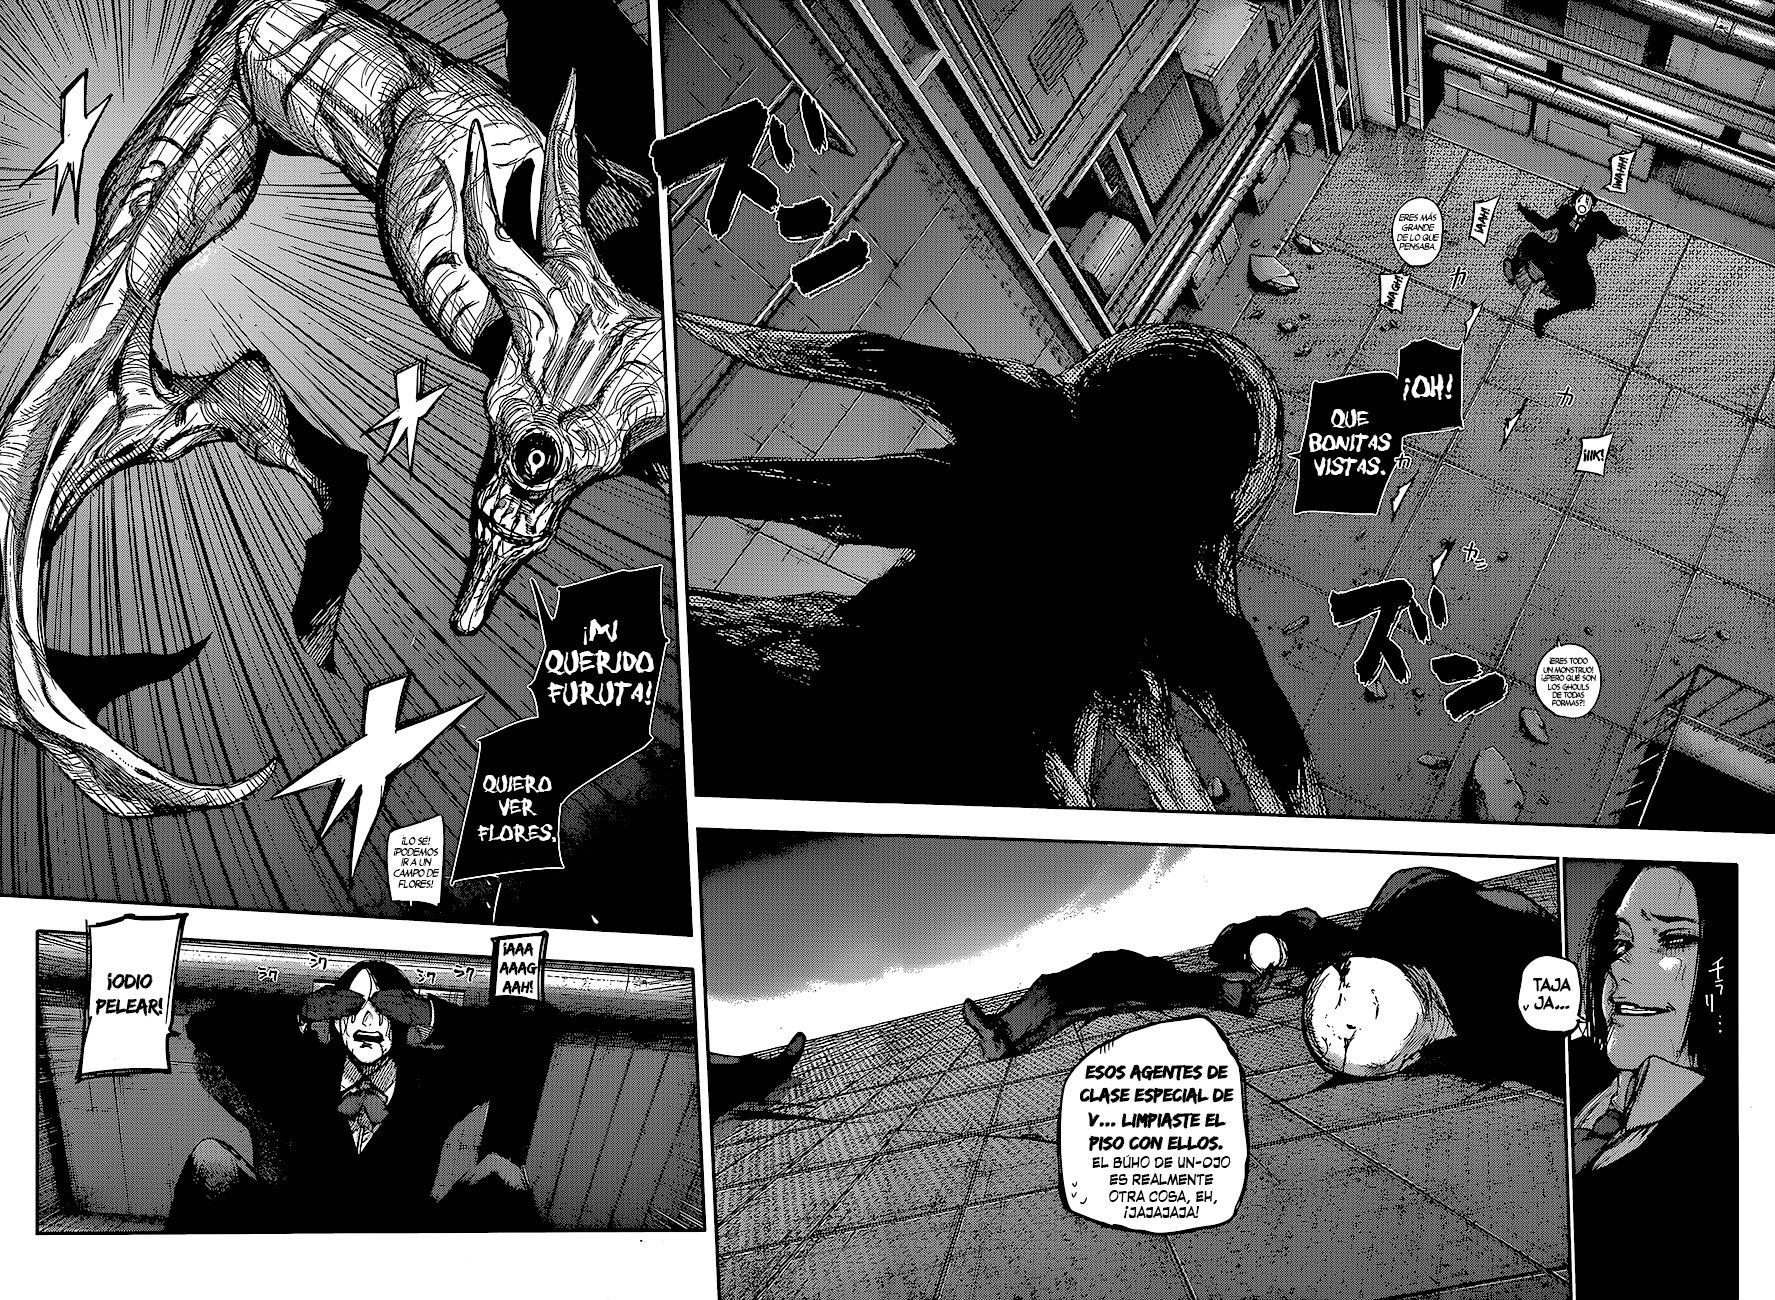 http://c5.ninemanga.com/es_manga/59/59/463779/a9d671a92095bb4bbd7ff64507e8f1e8.jpg Page 10